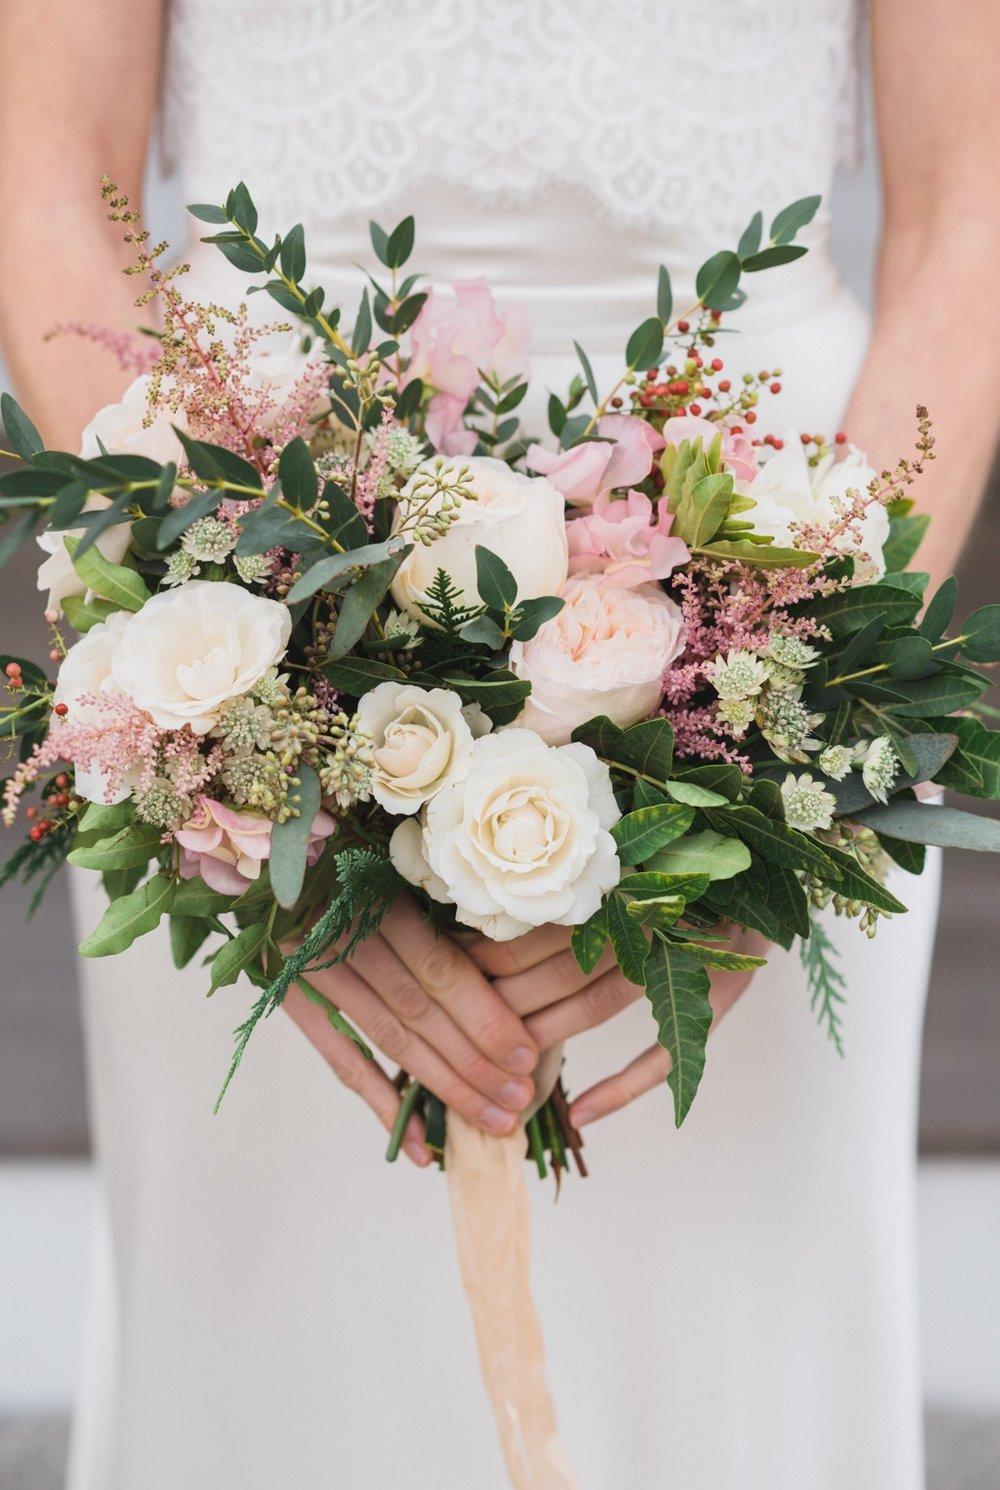 len_lynne_wedding_bouquets_edgartown-1875.jpg